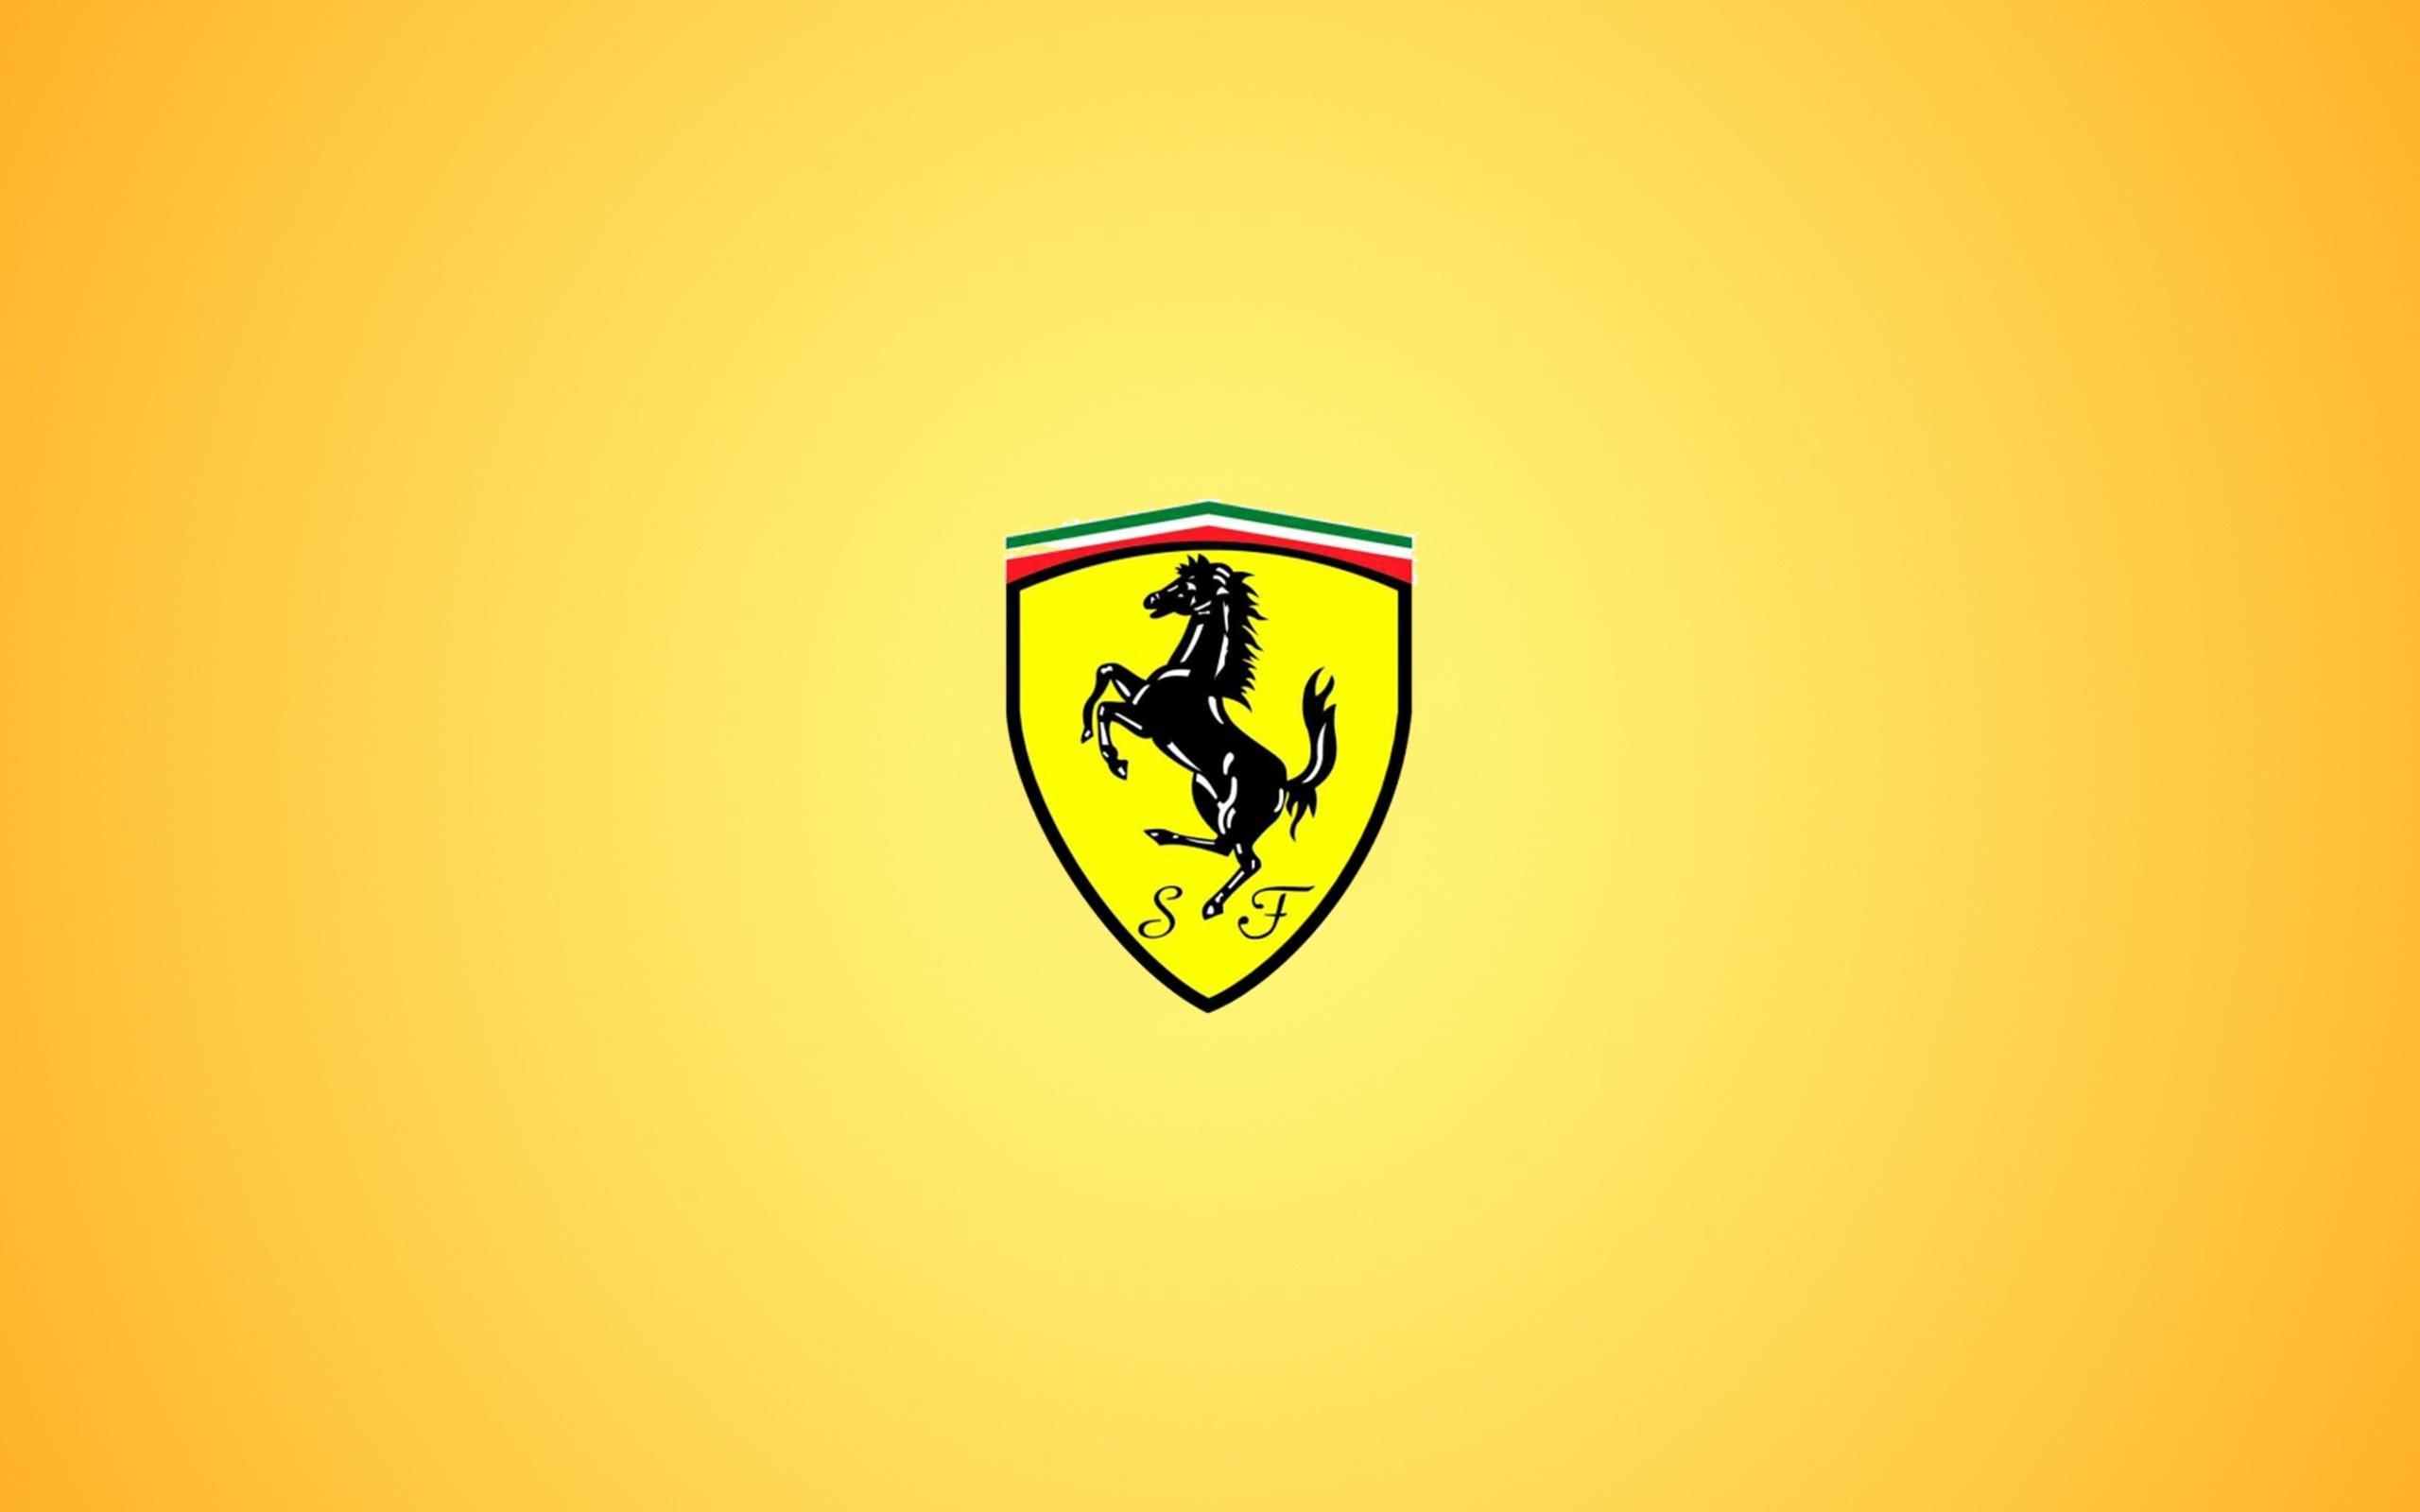 ferrari logo wallpaper background 116